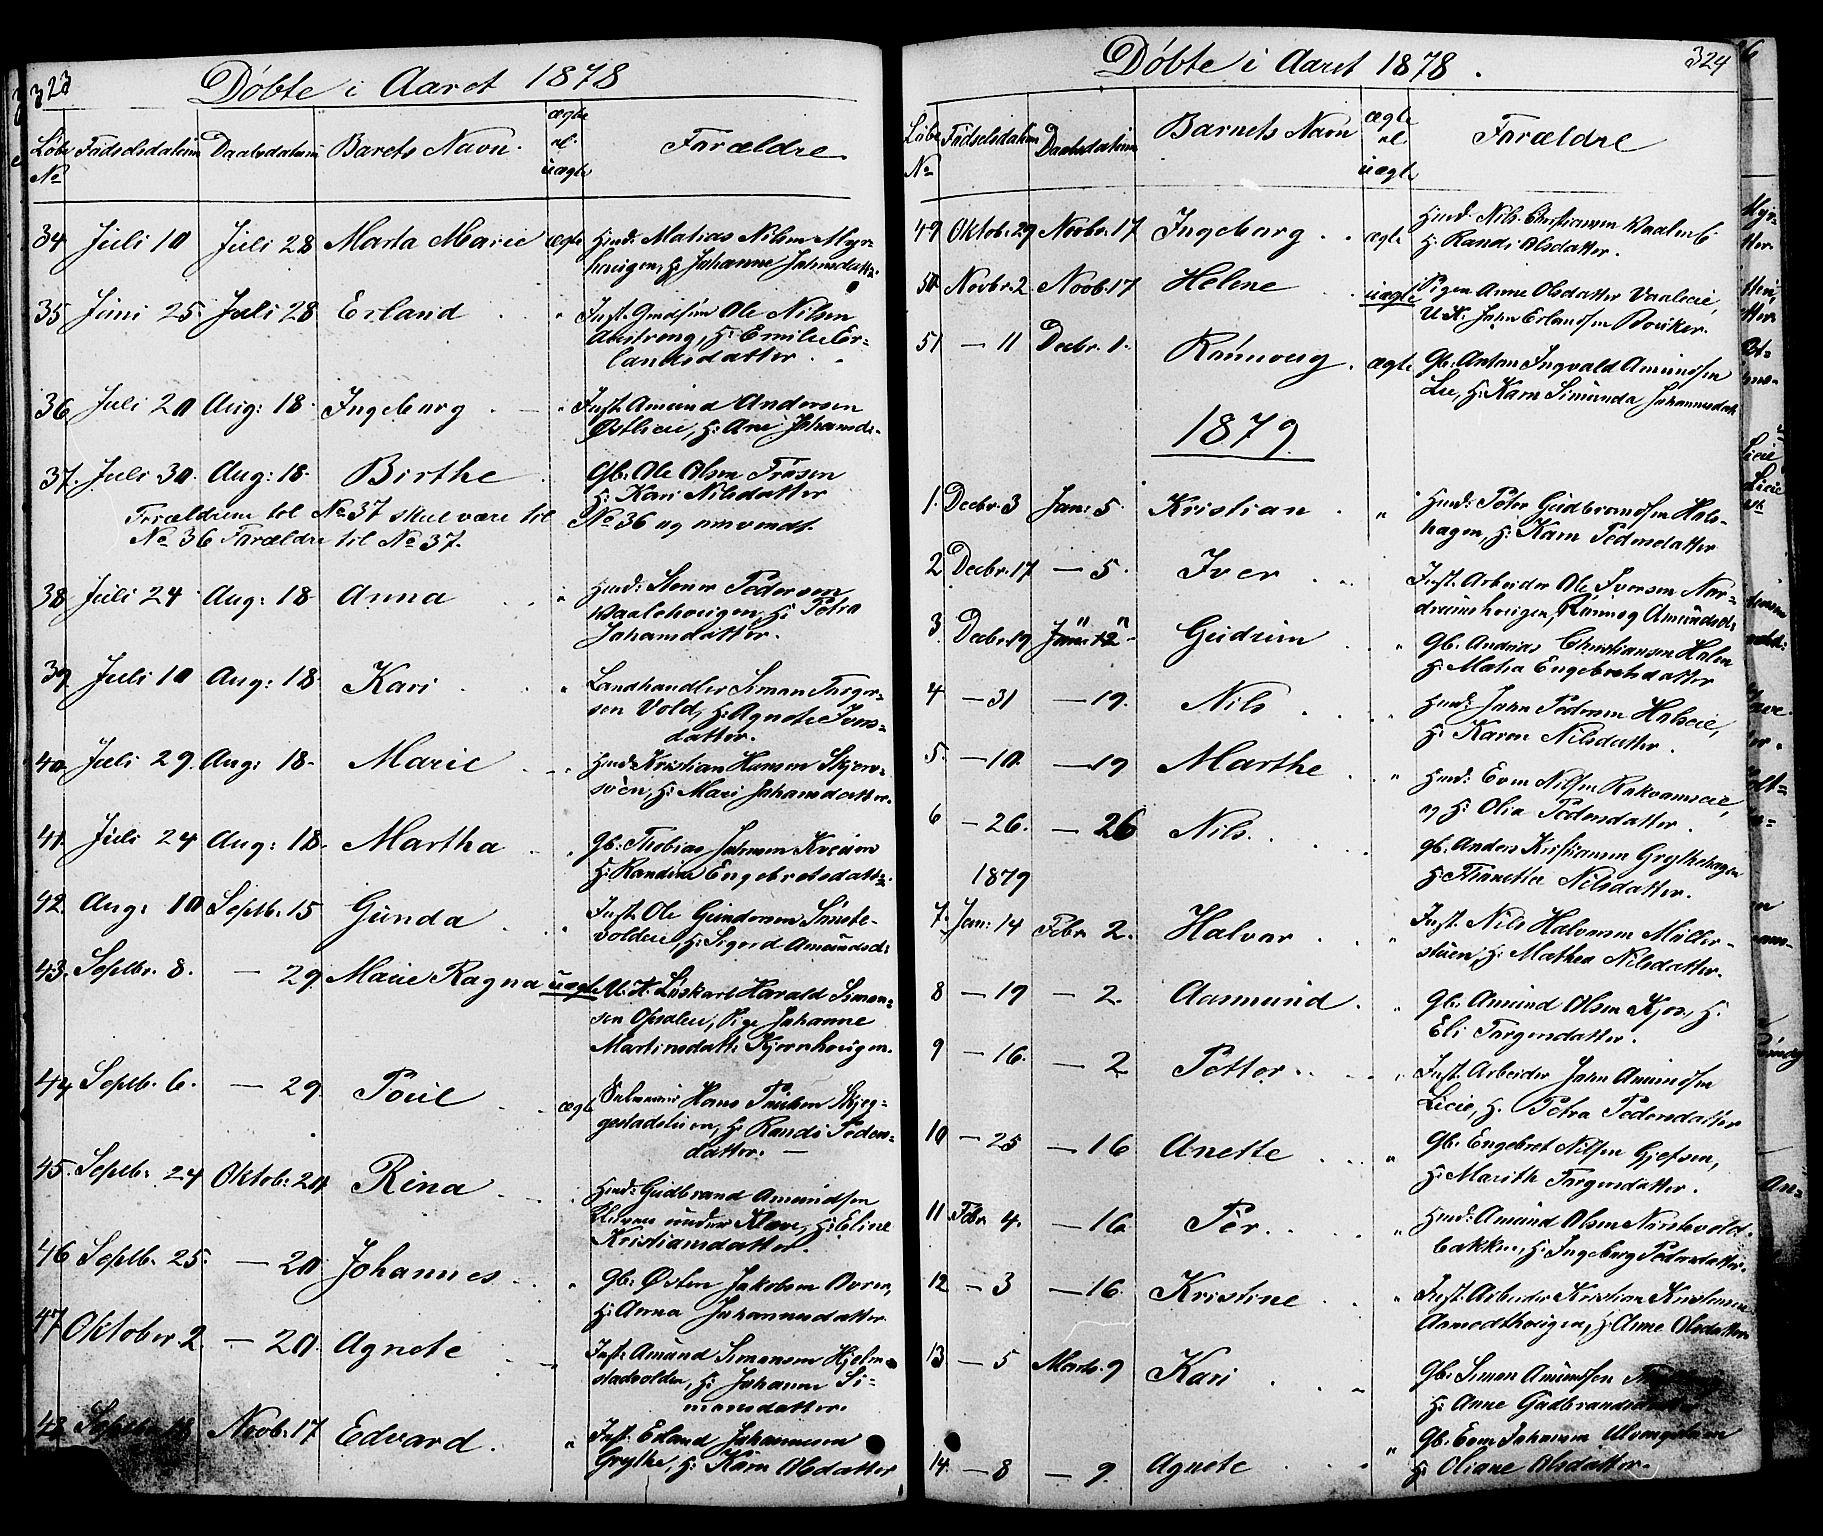 SAH, Østre Gausdal prestekontor, Klokkerbok nr. 1, 1863-1893, s. 323-324